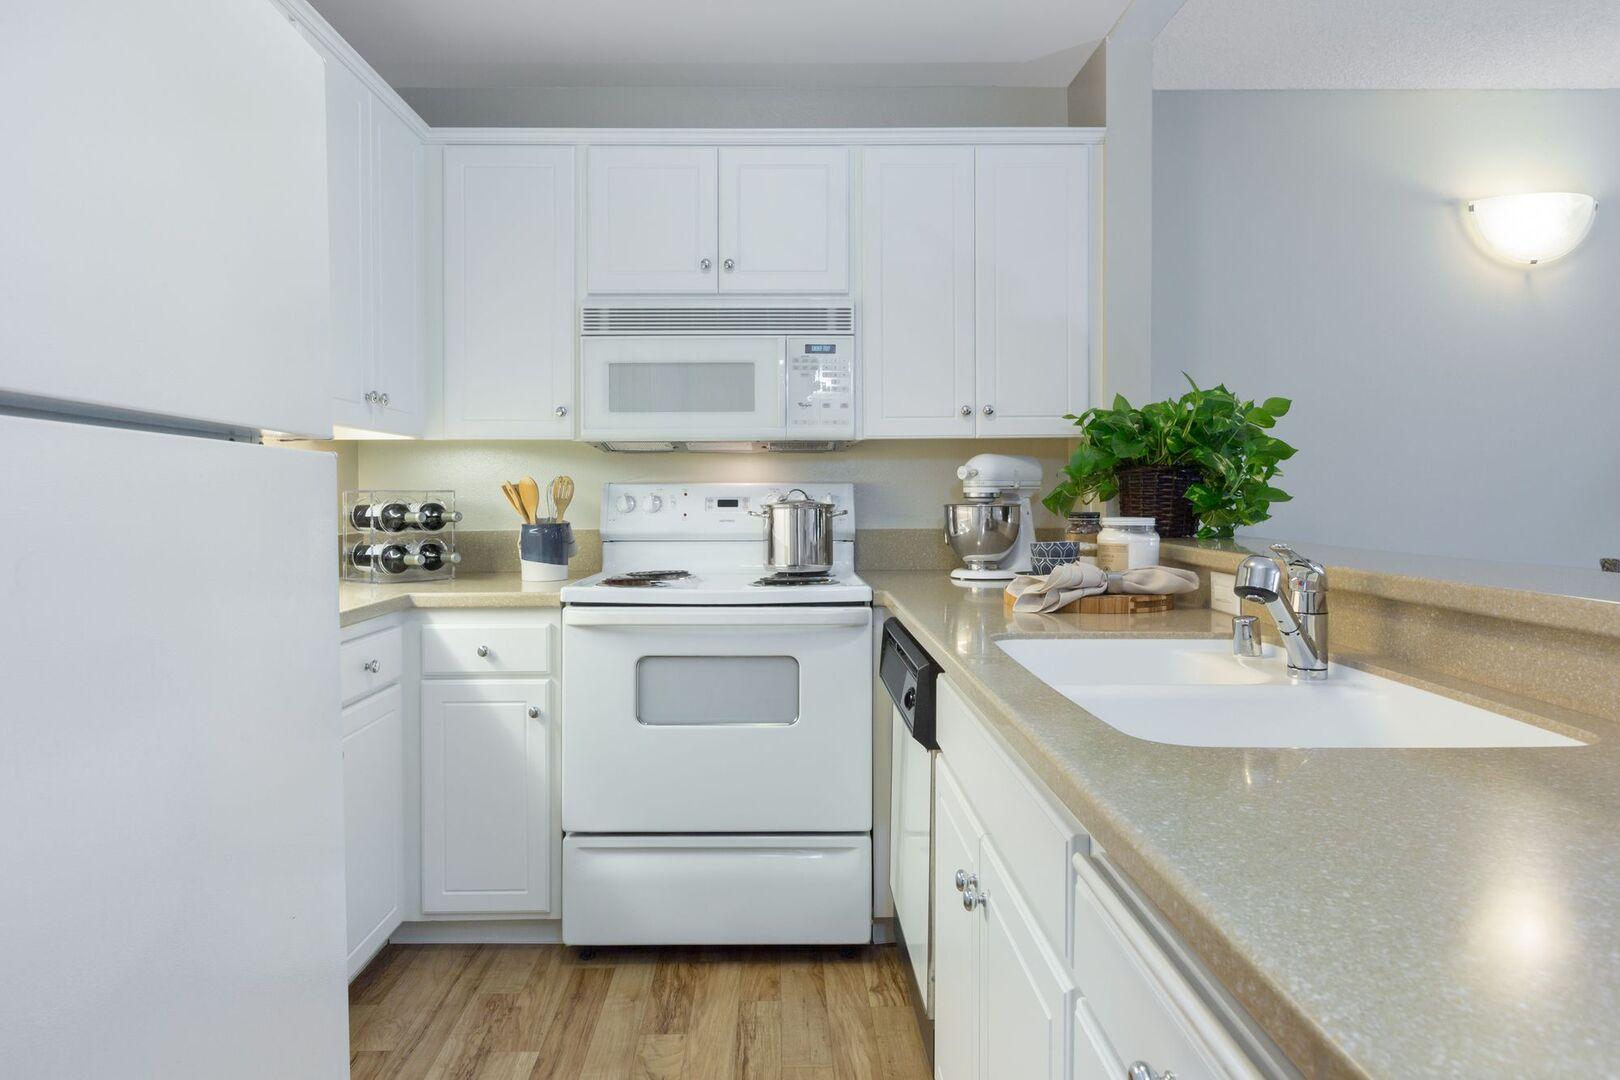 Apartments for Rent in Newport Beach, CA | Park Newport - Home